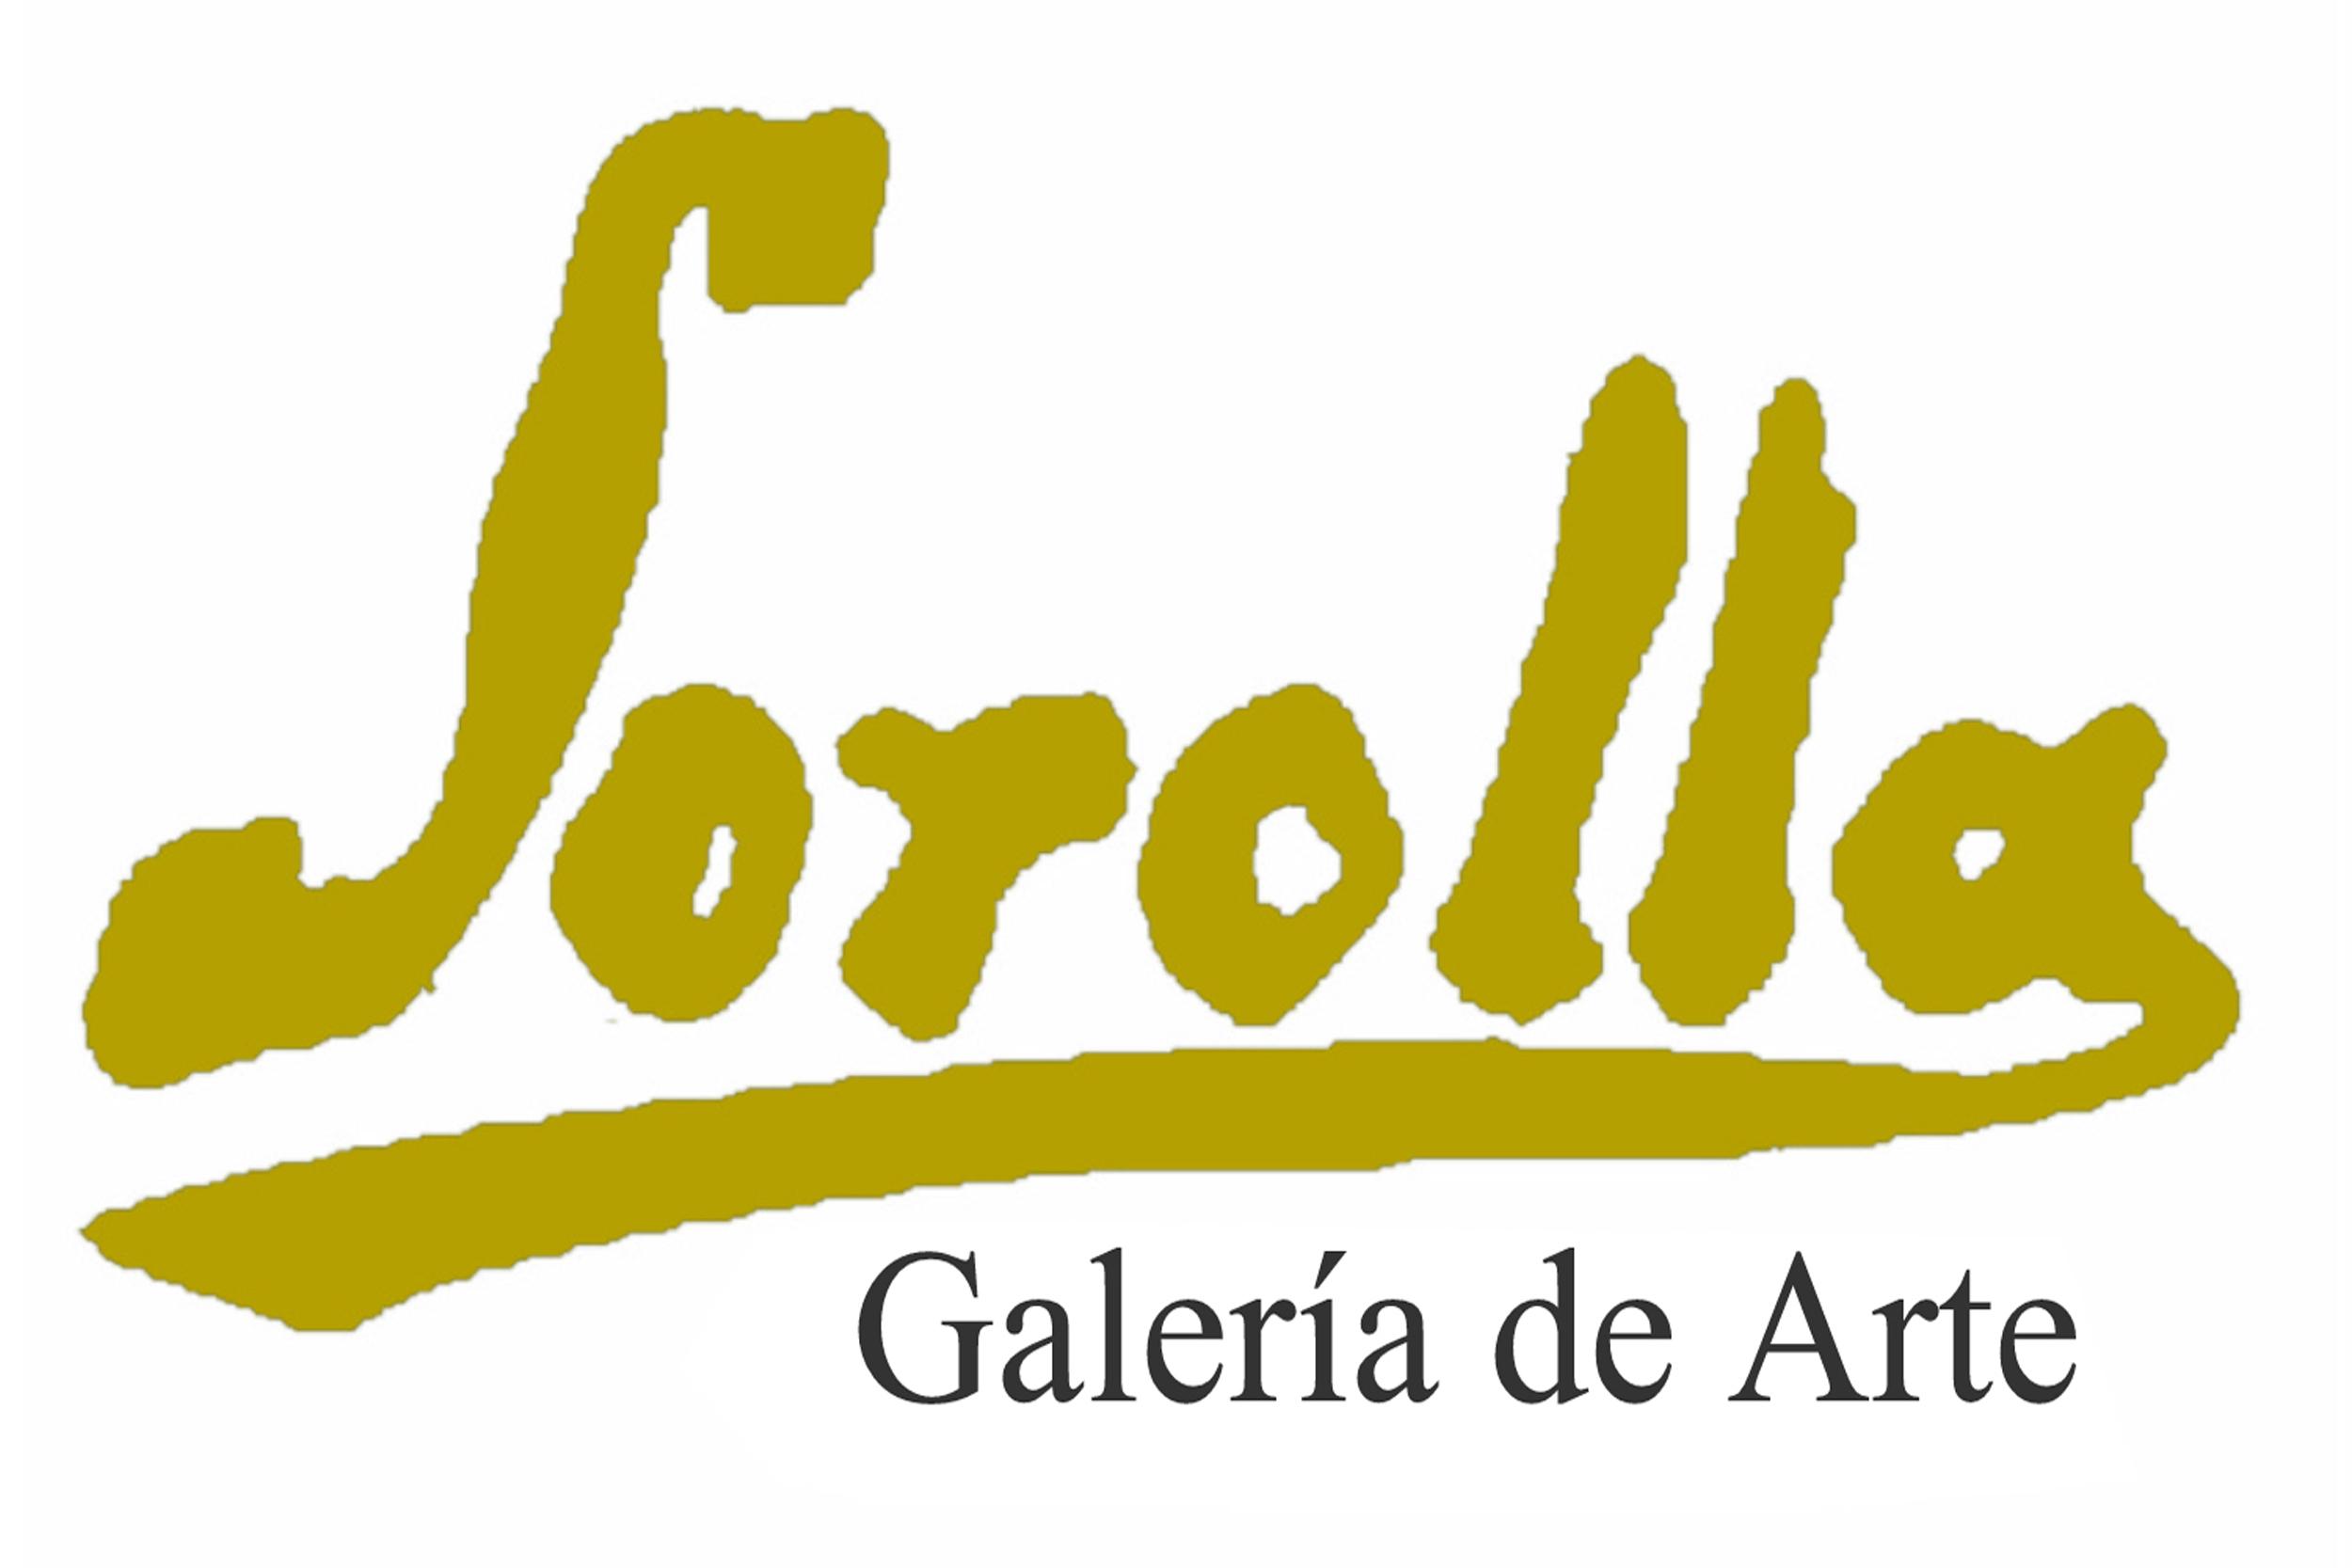 Galeria de arte en sevilla galeria sorolla - Galeria de arte sorolla ...